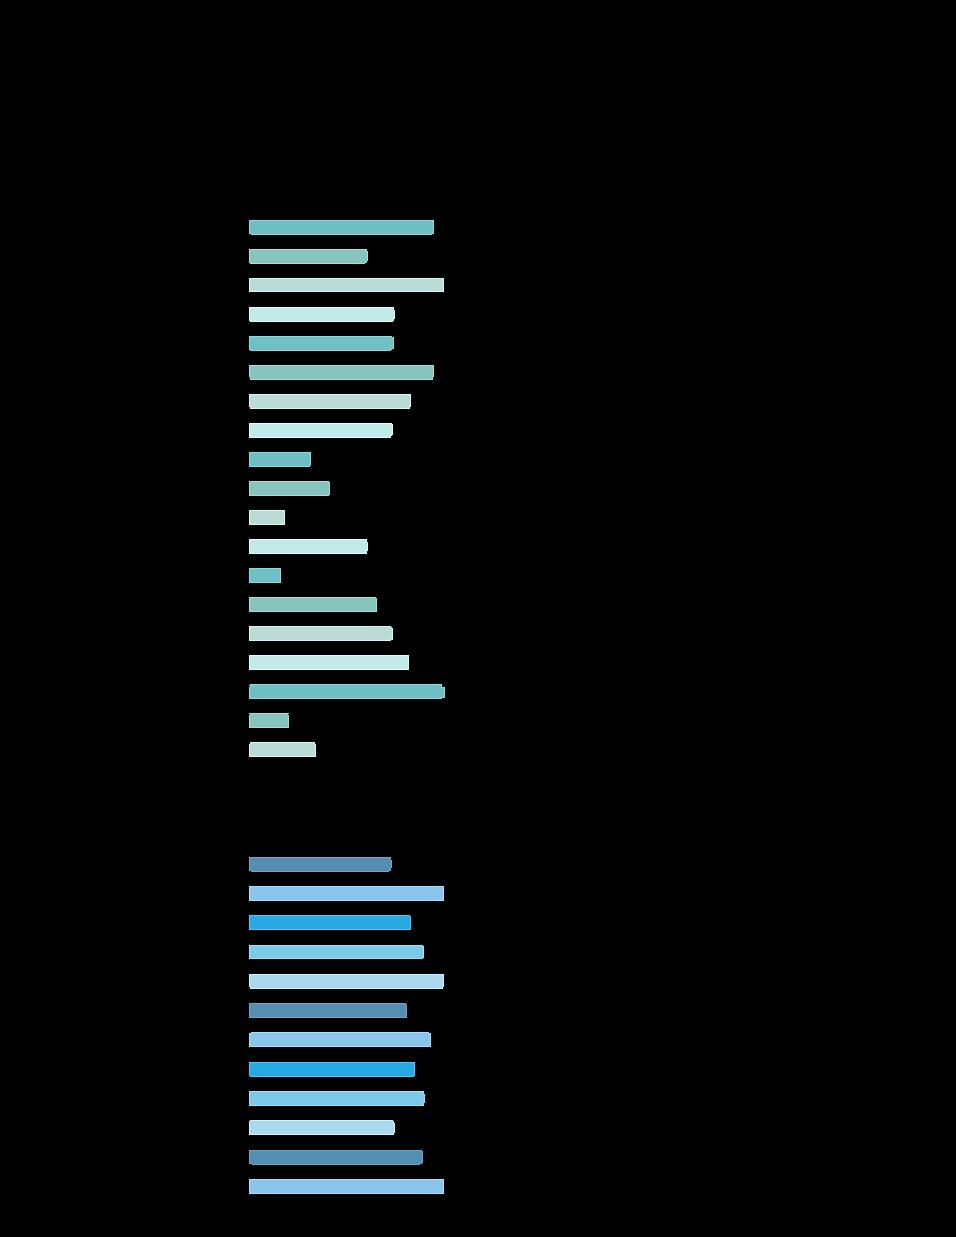 Richbourg Biomedical Visualization Resume